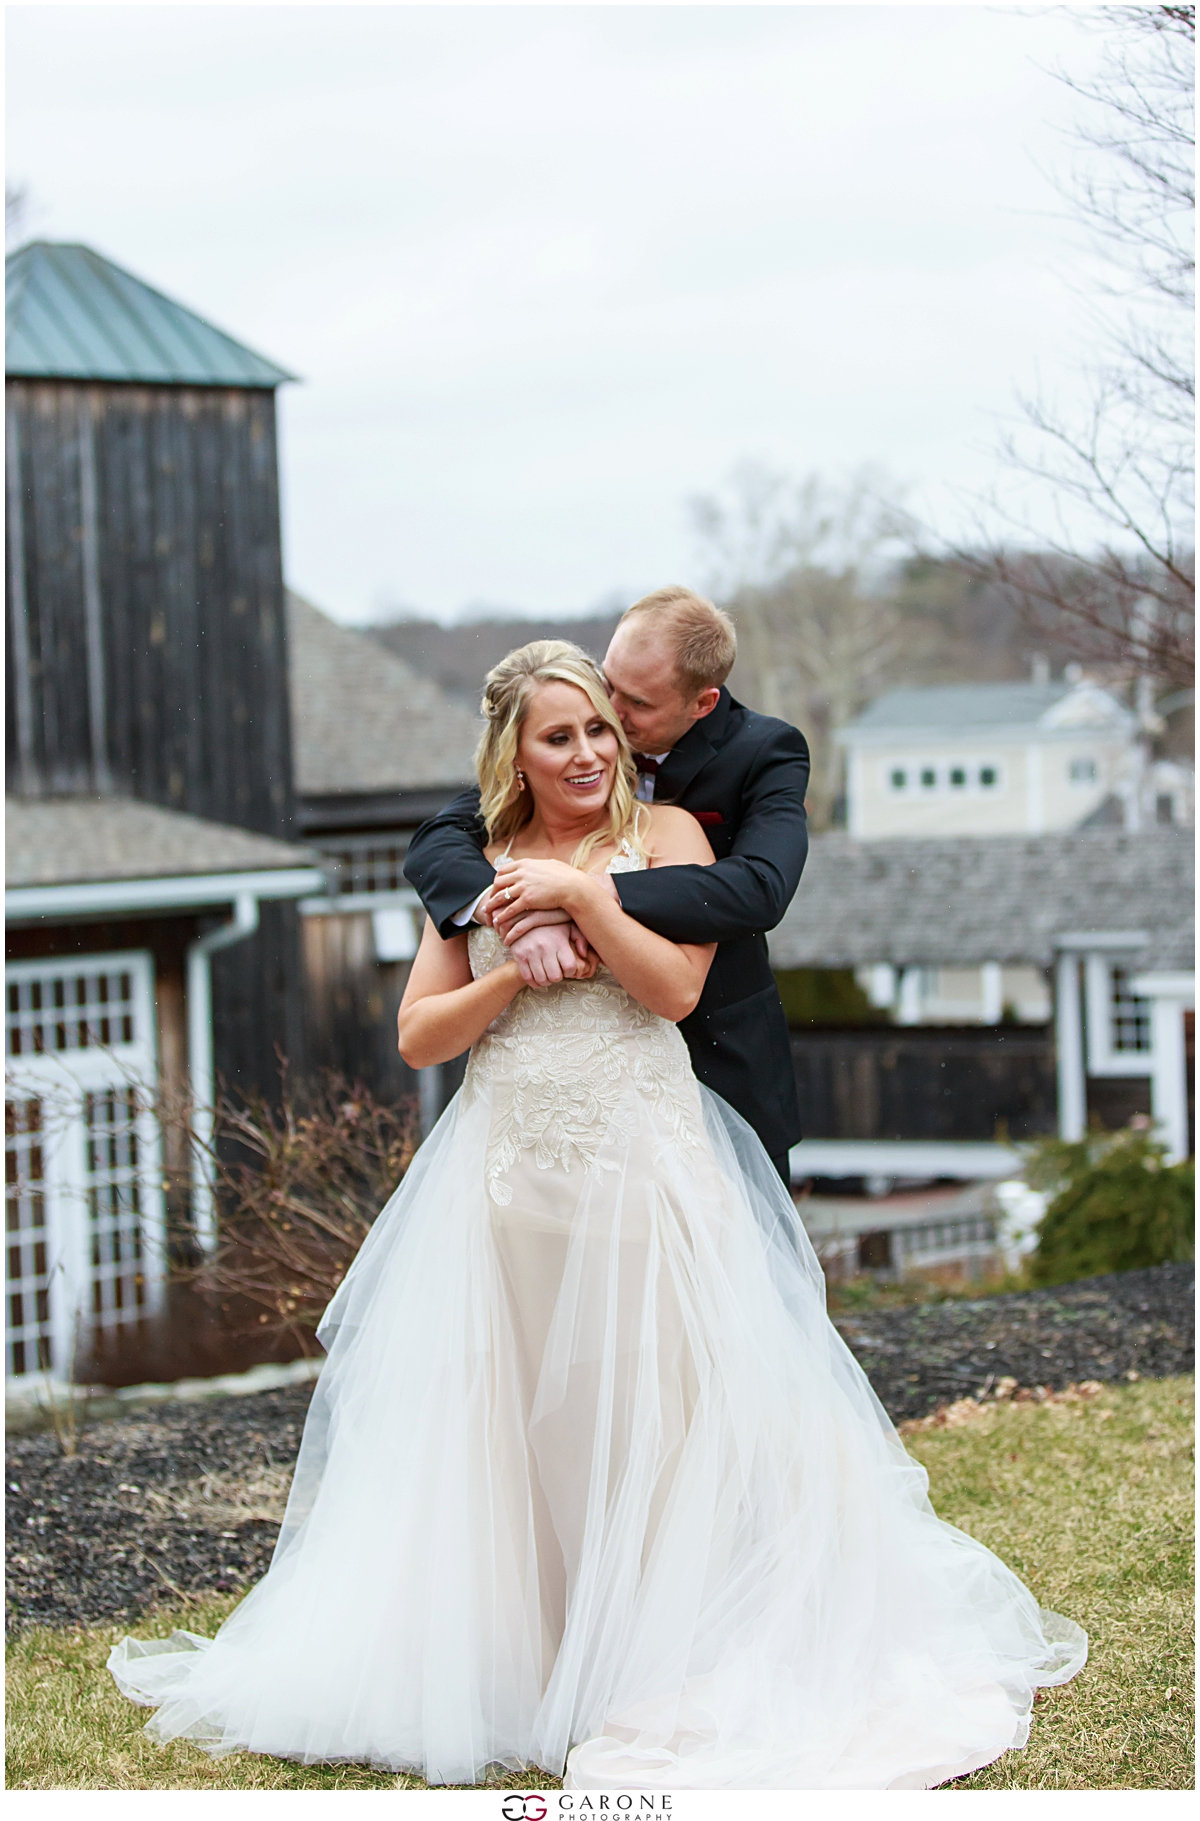 Brooke_Kenzie_Red_Lion_Inn_Cohasset_Ma_Boston_Wedding_Photographer_0094.jpg